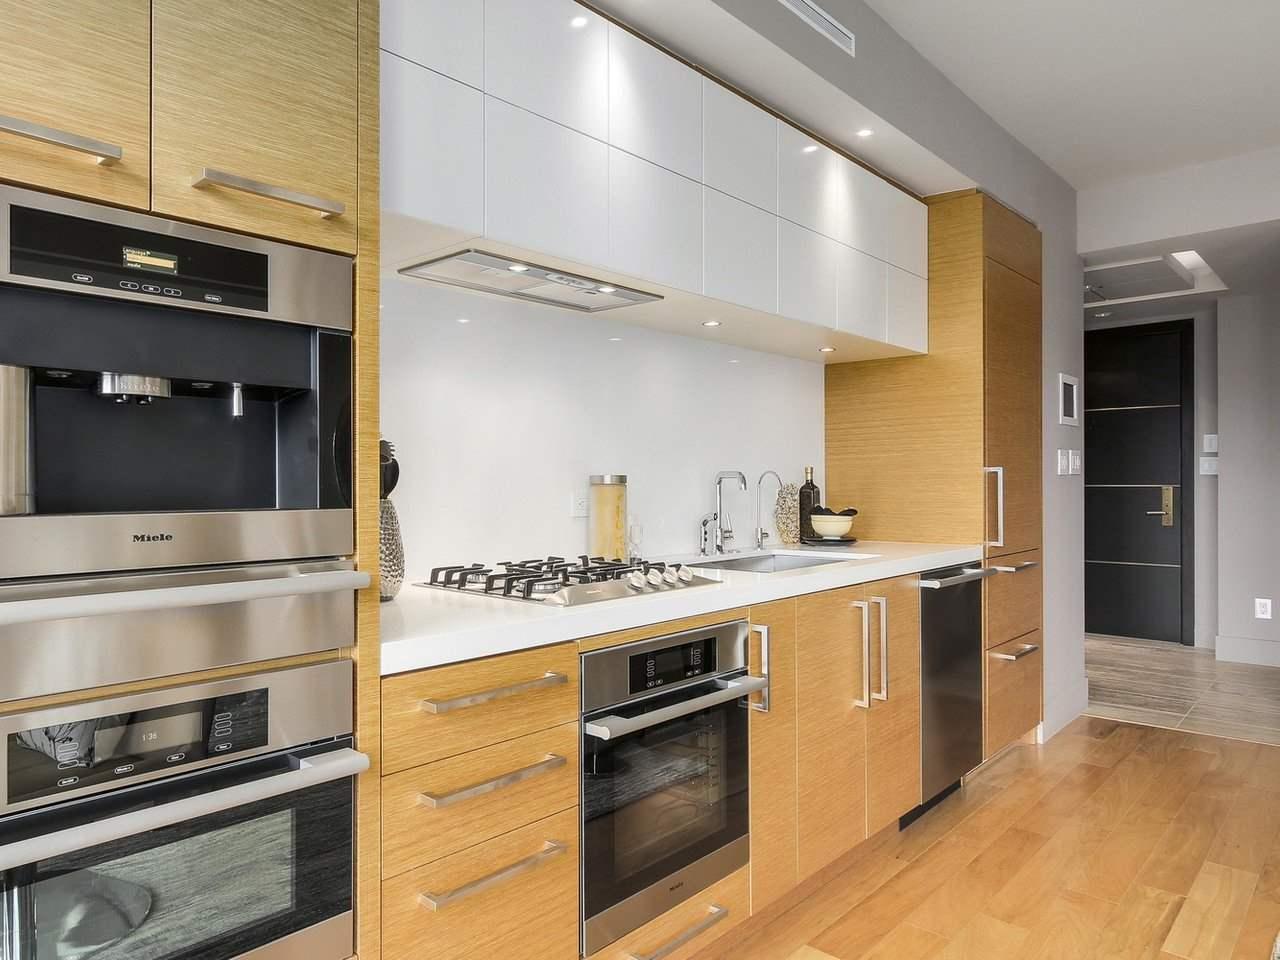 Condo Apartment at 2703 667 HOWE STREET, Unit 2703, Vancouver West, British Columbia. Image 10